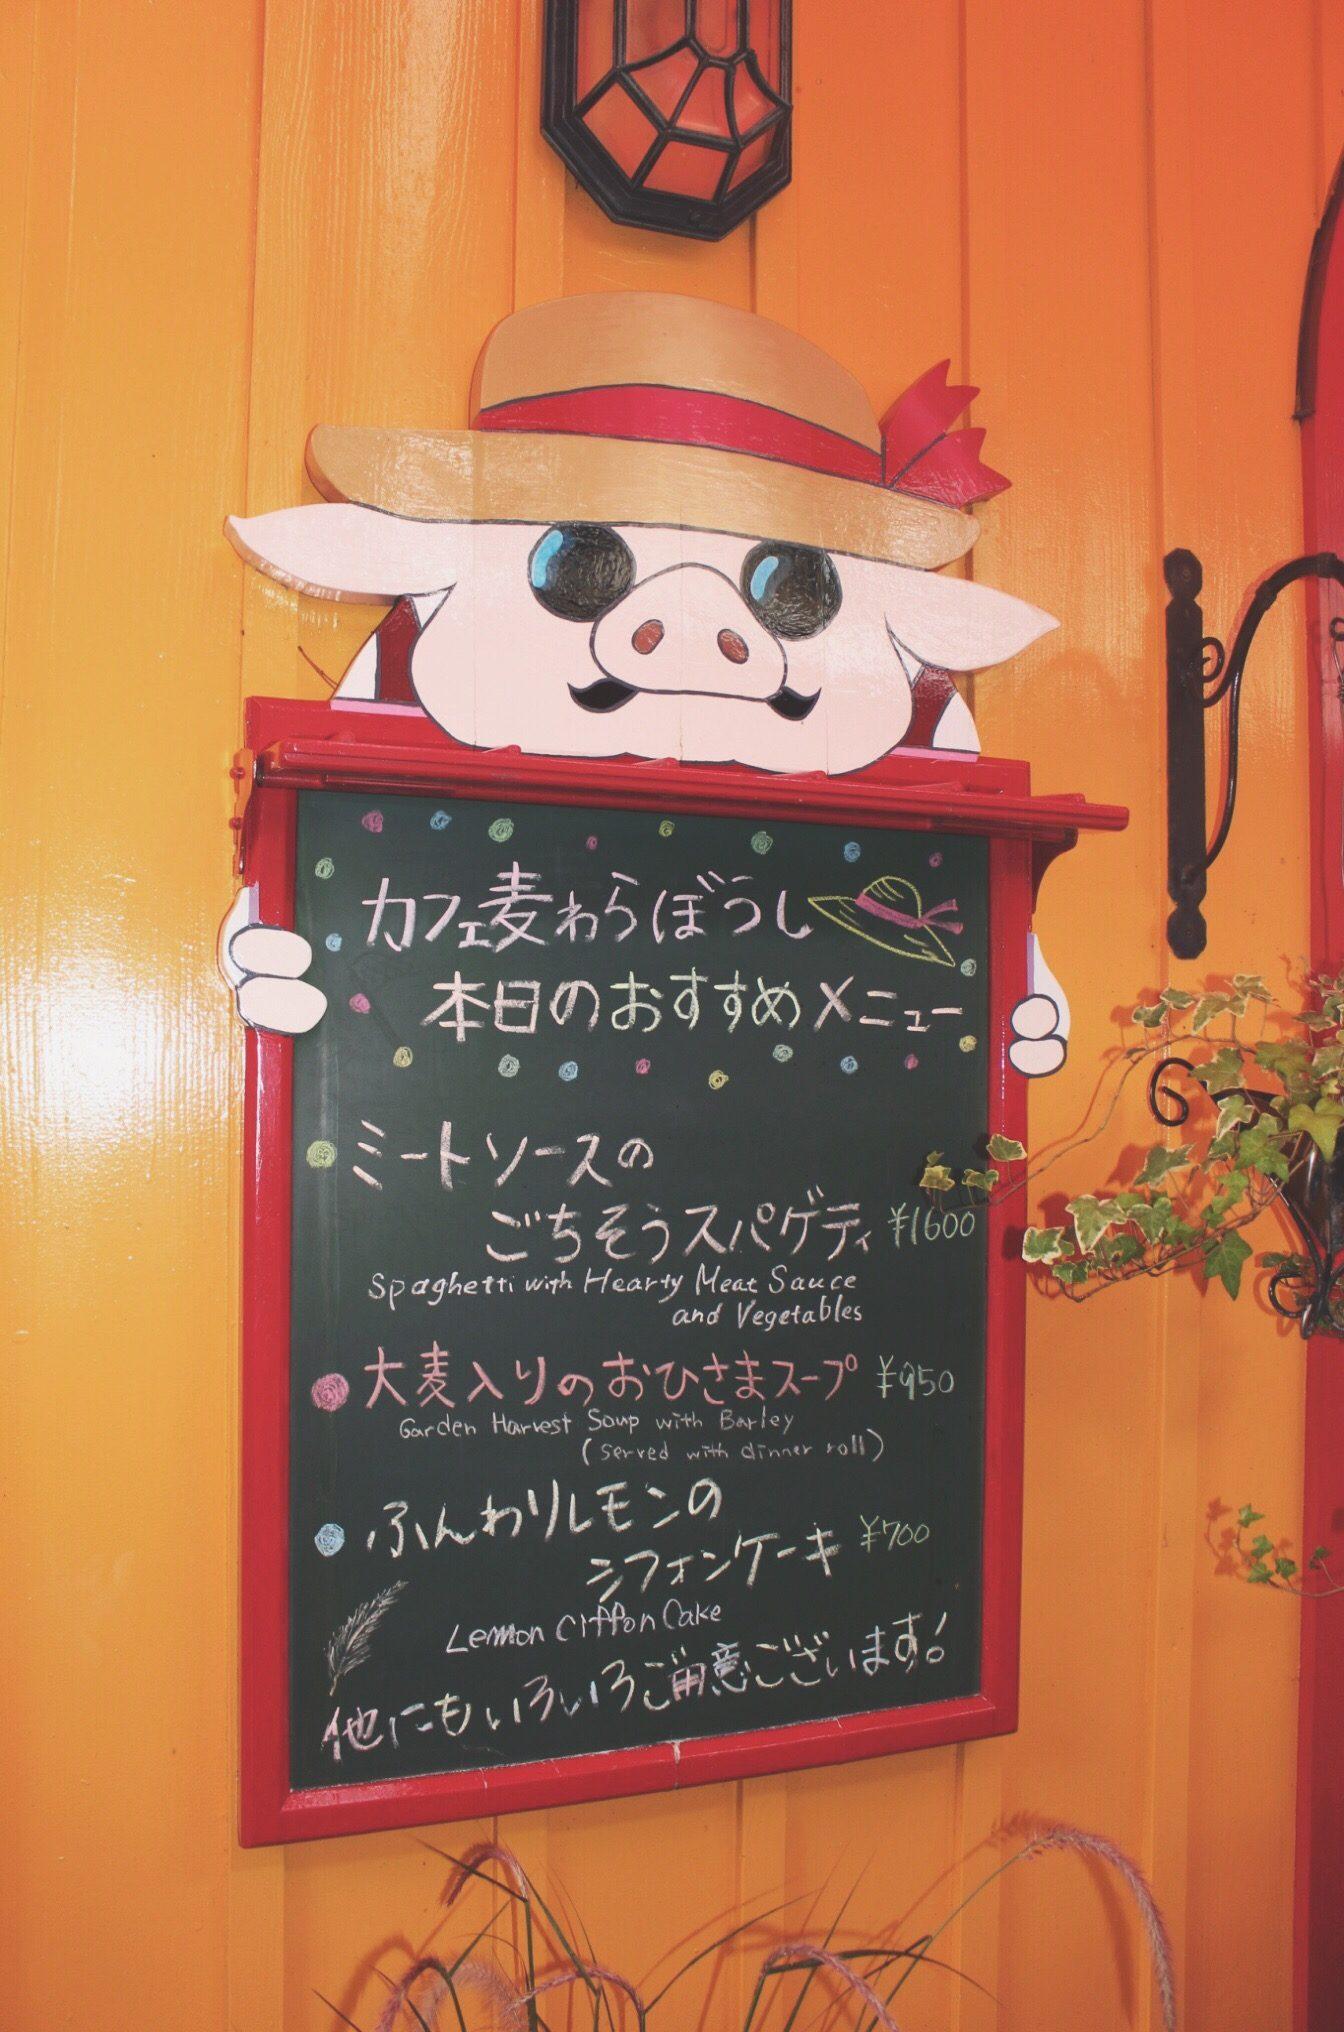 ghibli-museum_cafe